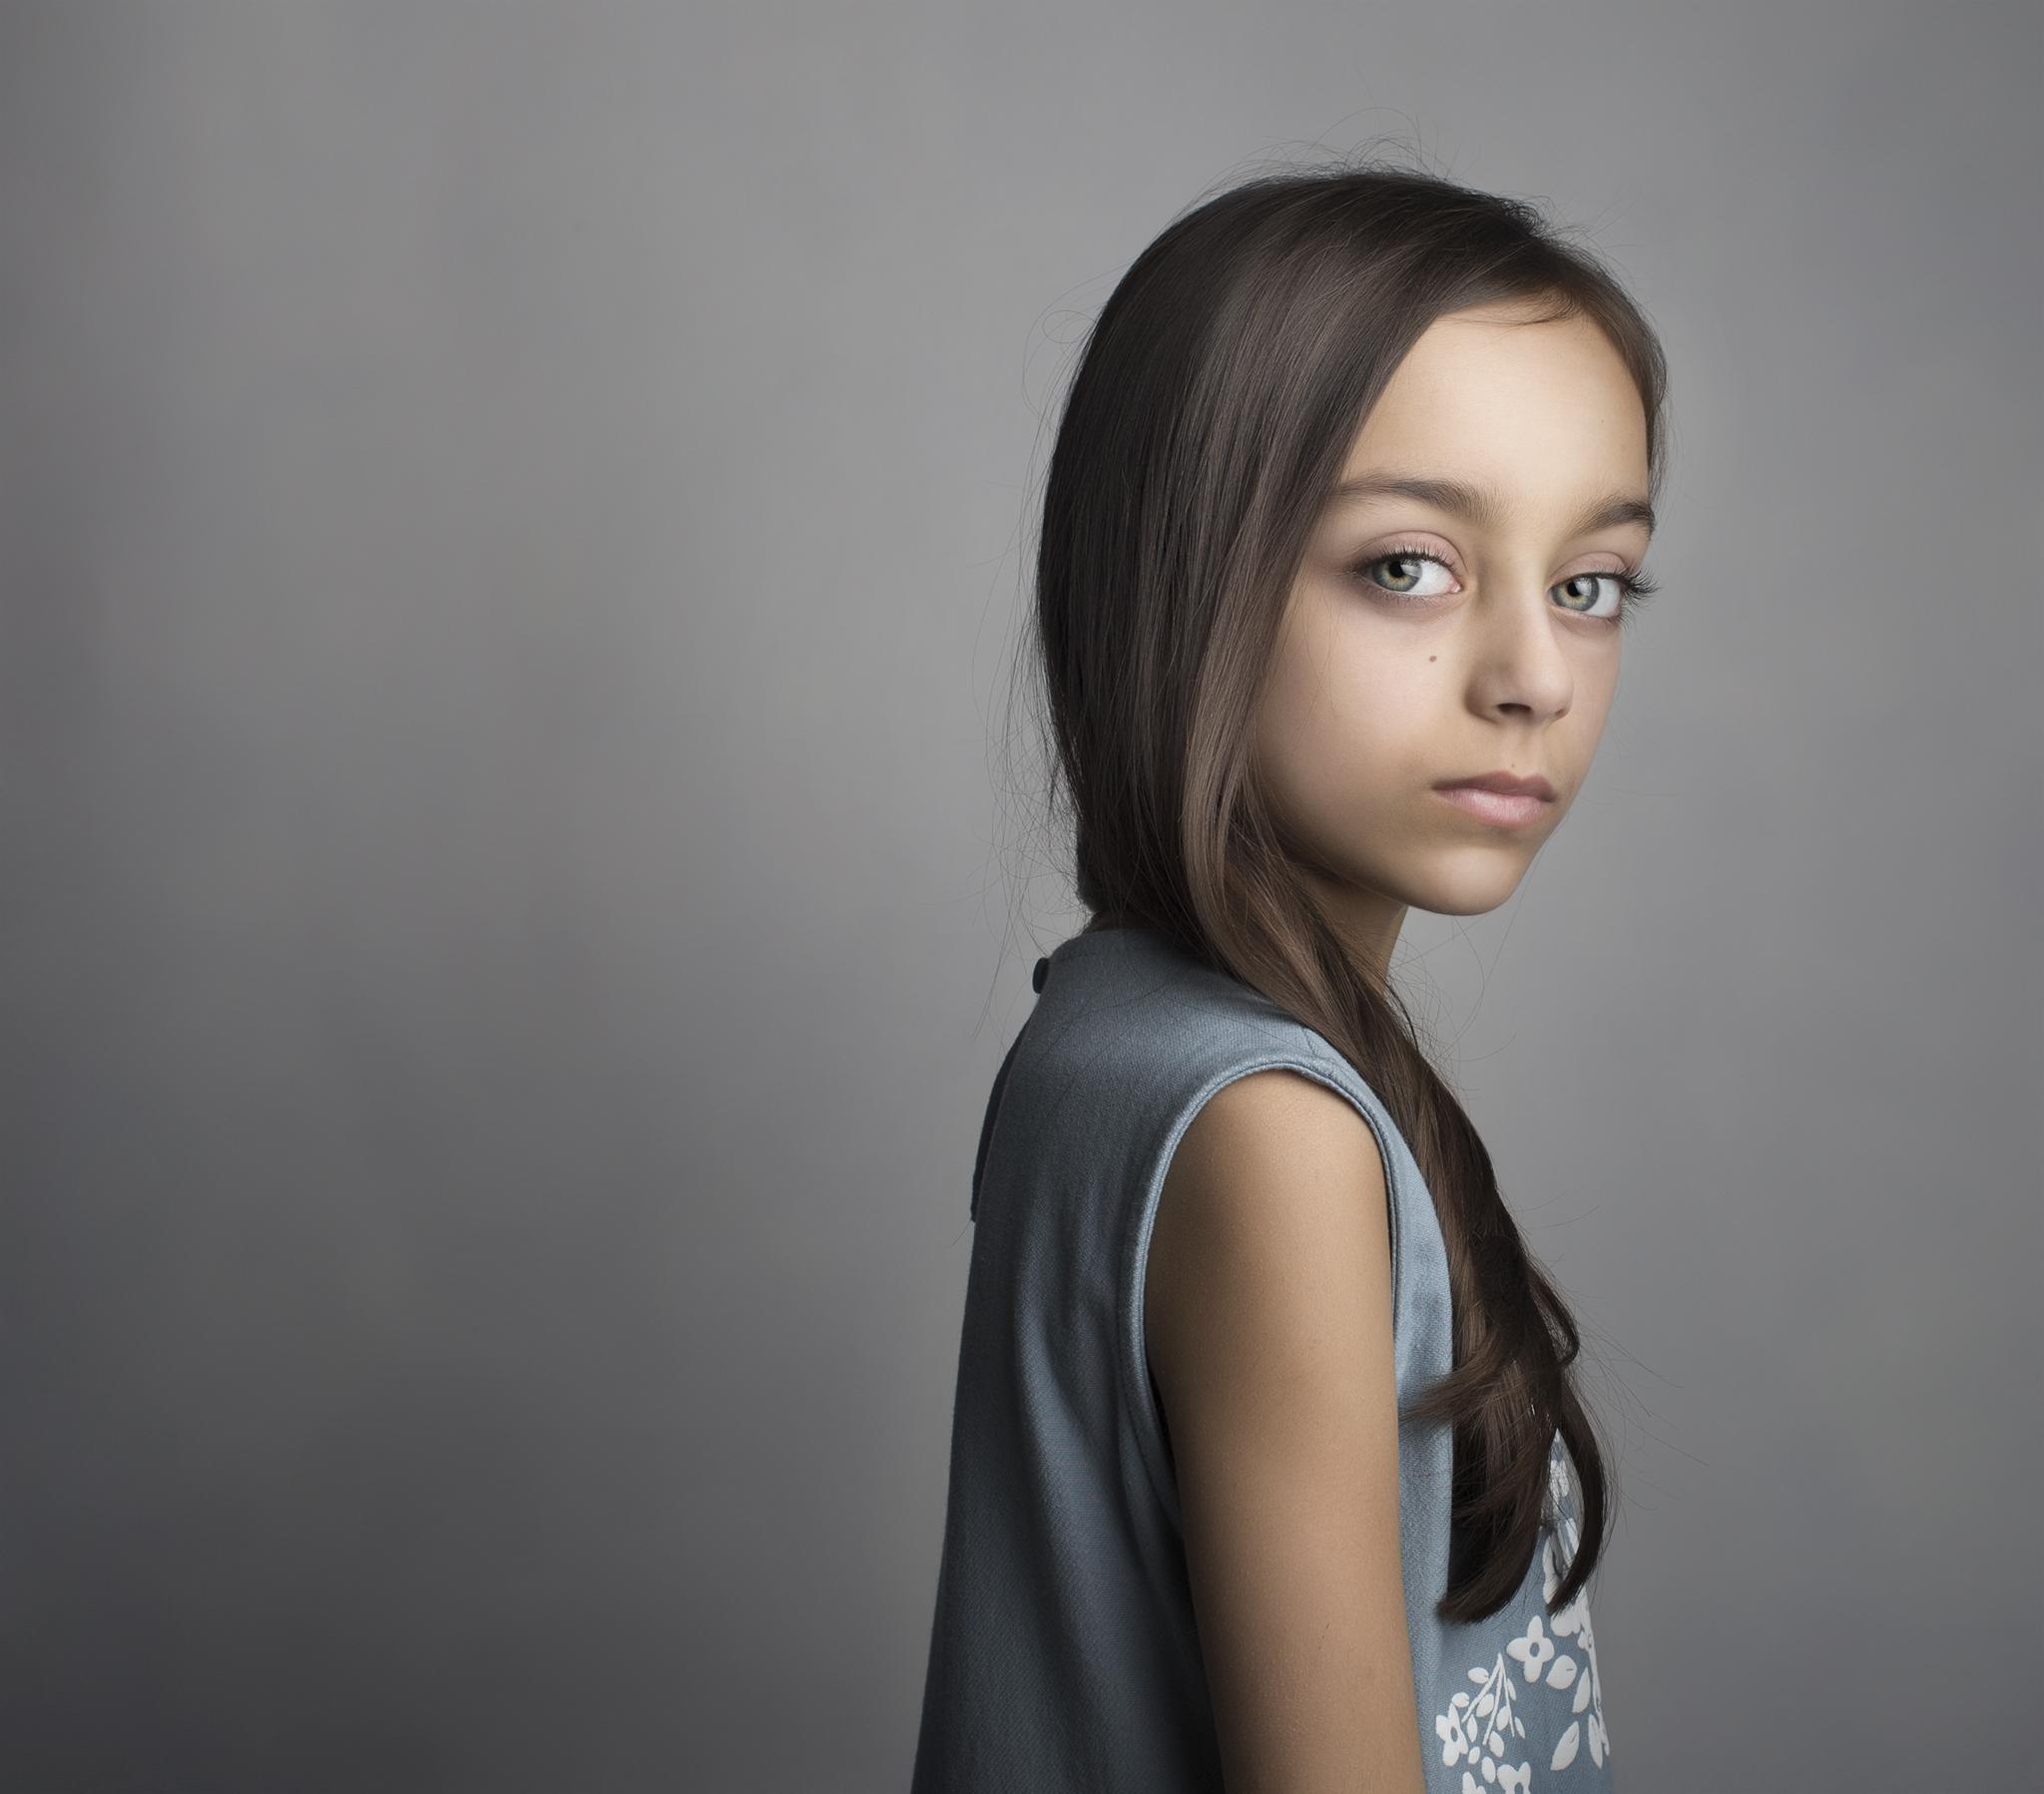 elizabethg_photography_hertfordshire_fineart_child_portrait_model_sophia_tailor_1.jpg